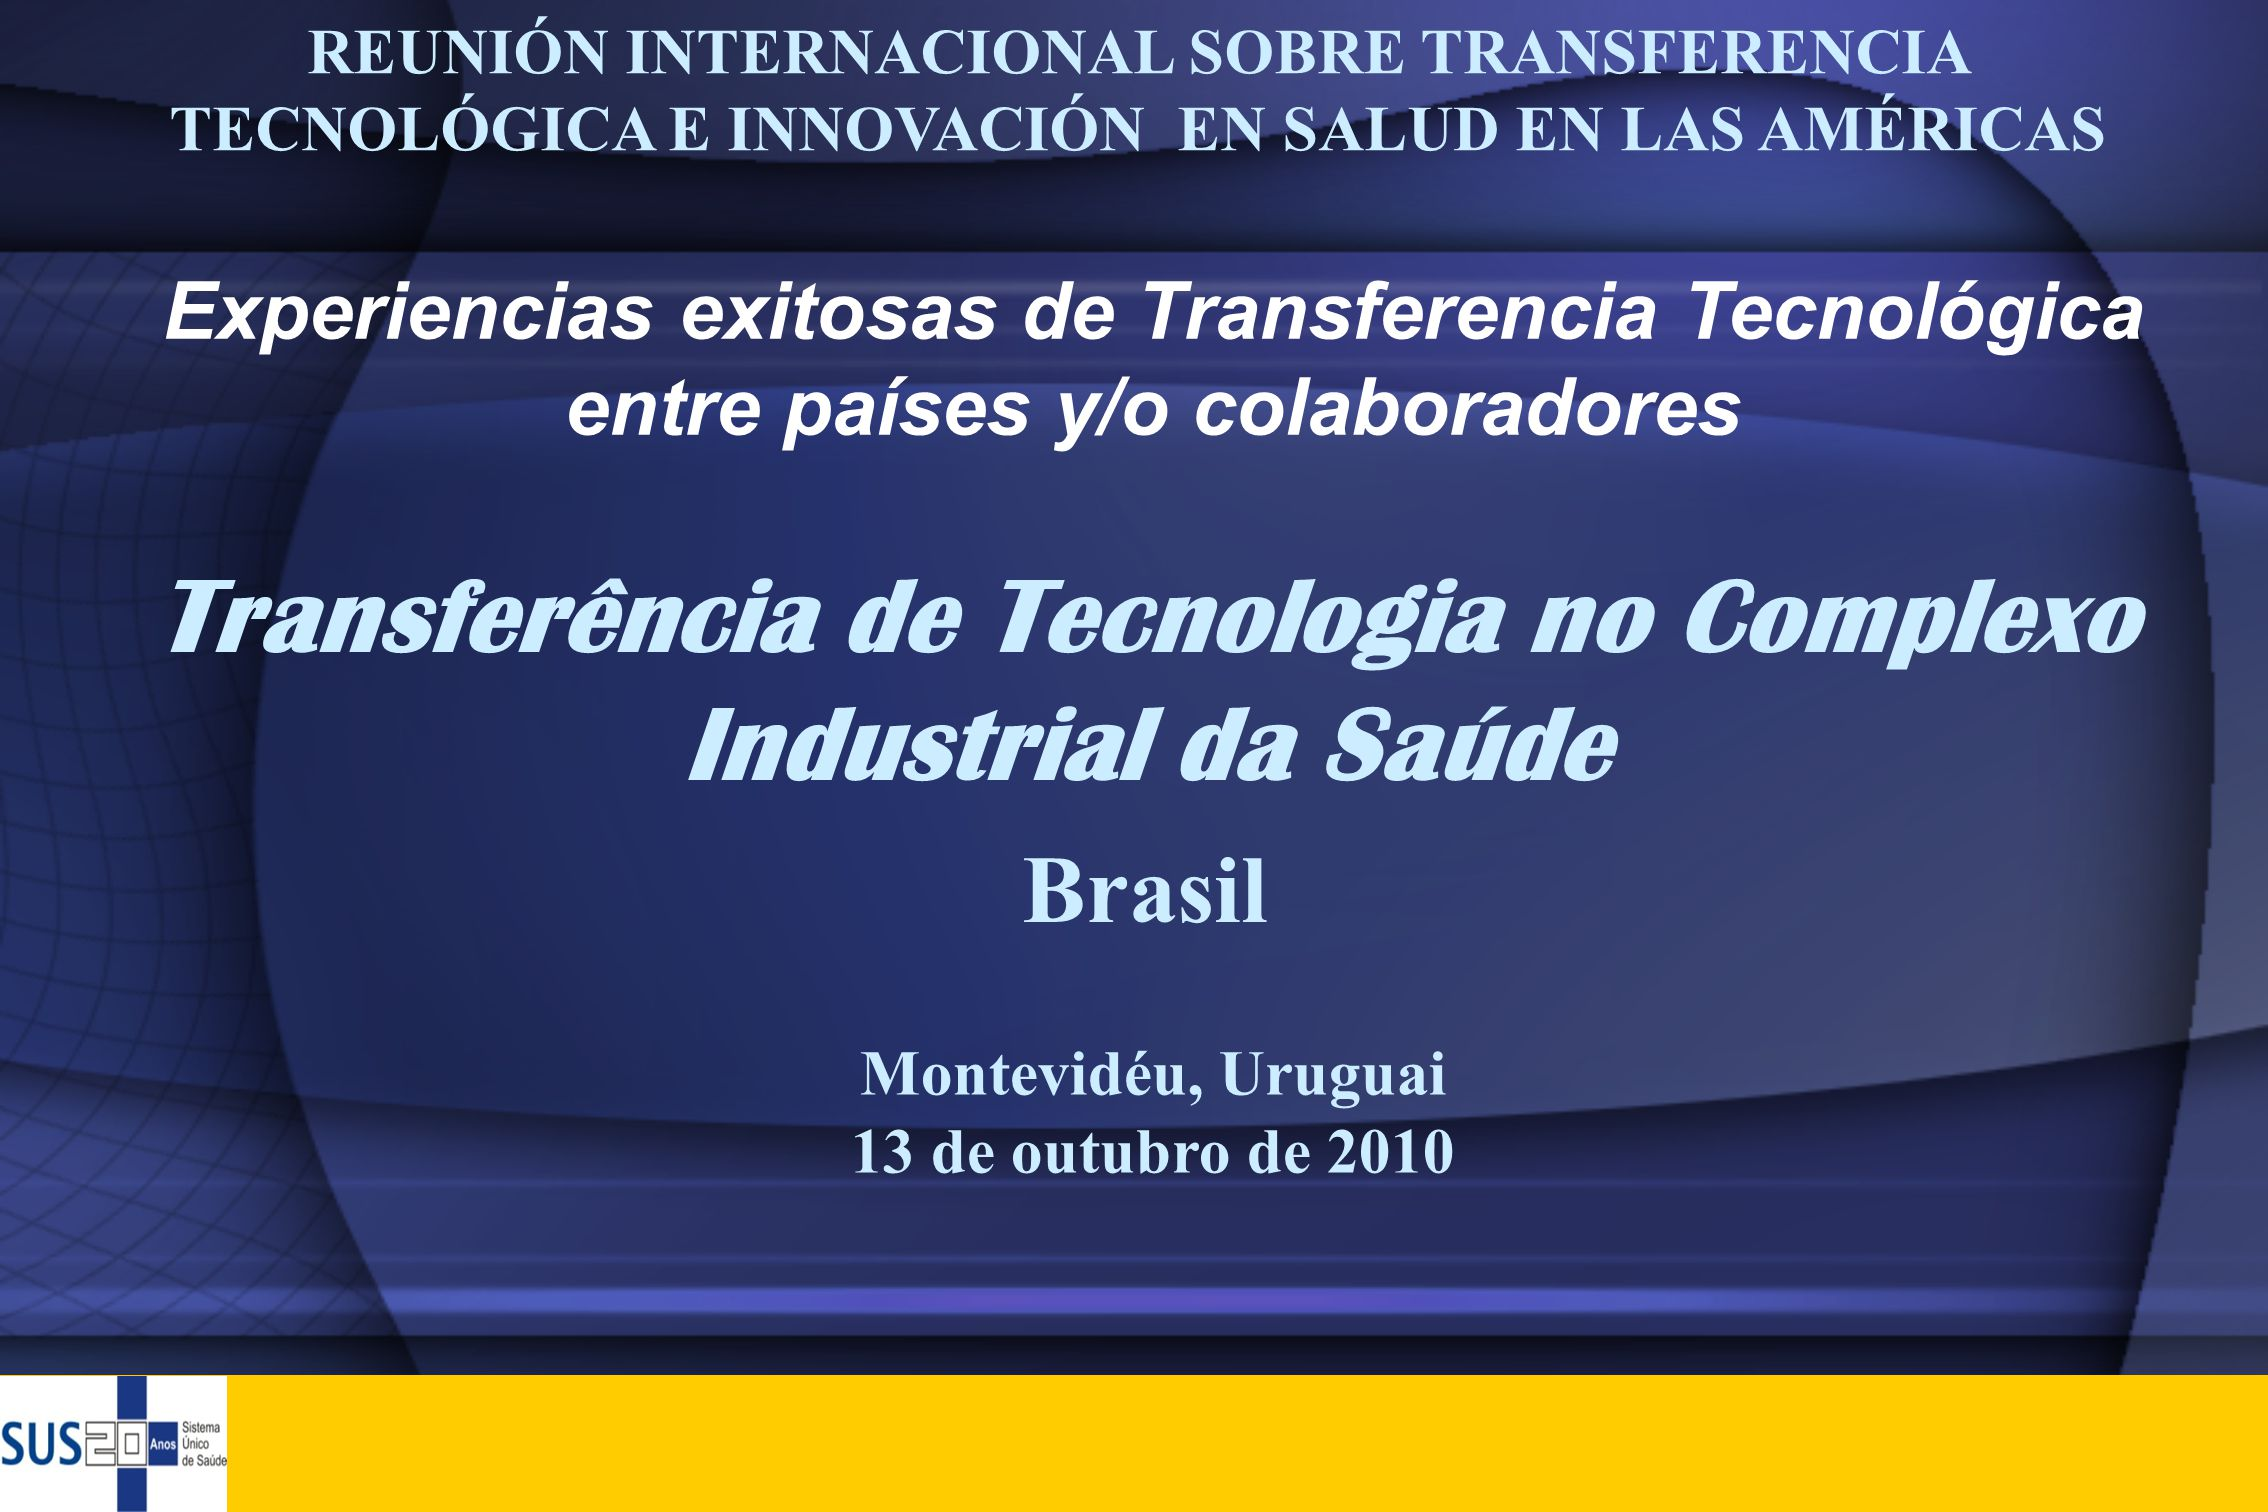 Transferência de Tecnologia no Complexo Industrial da Saúde